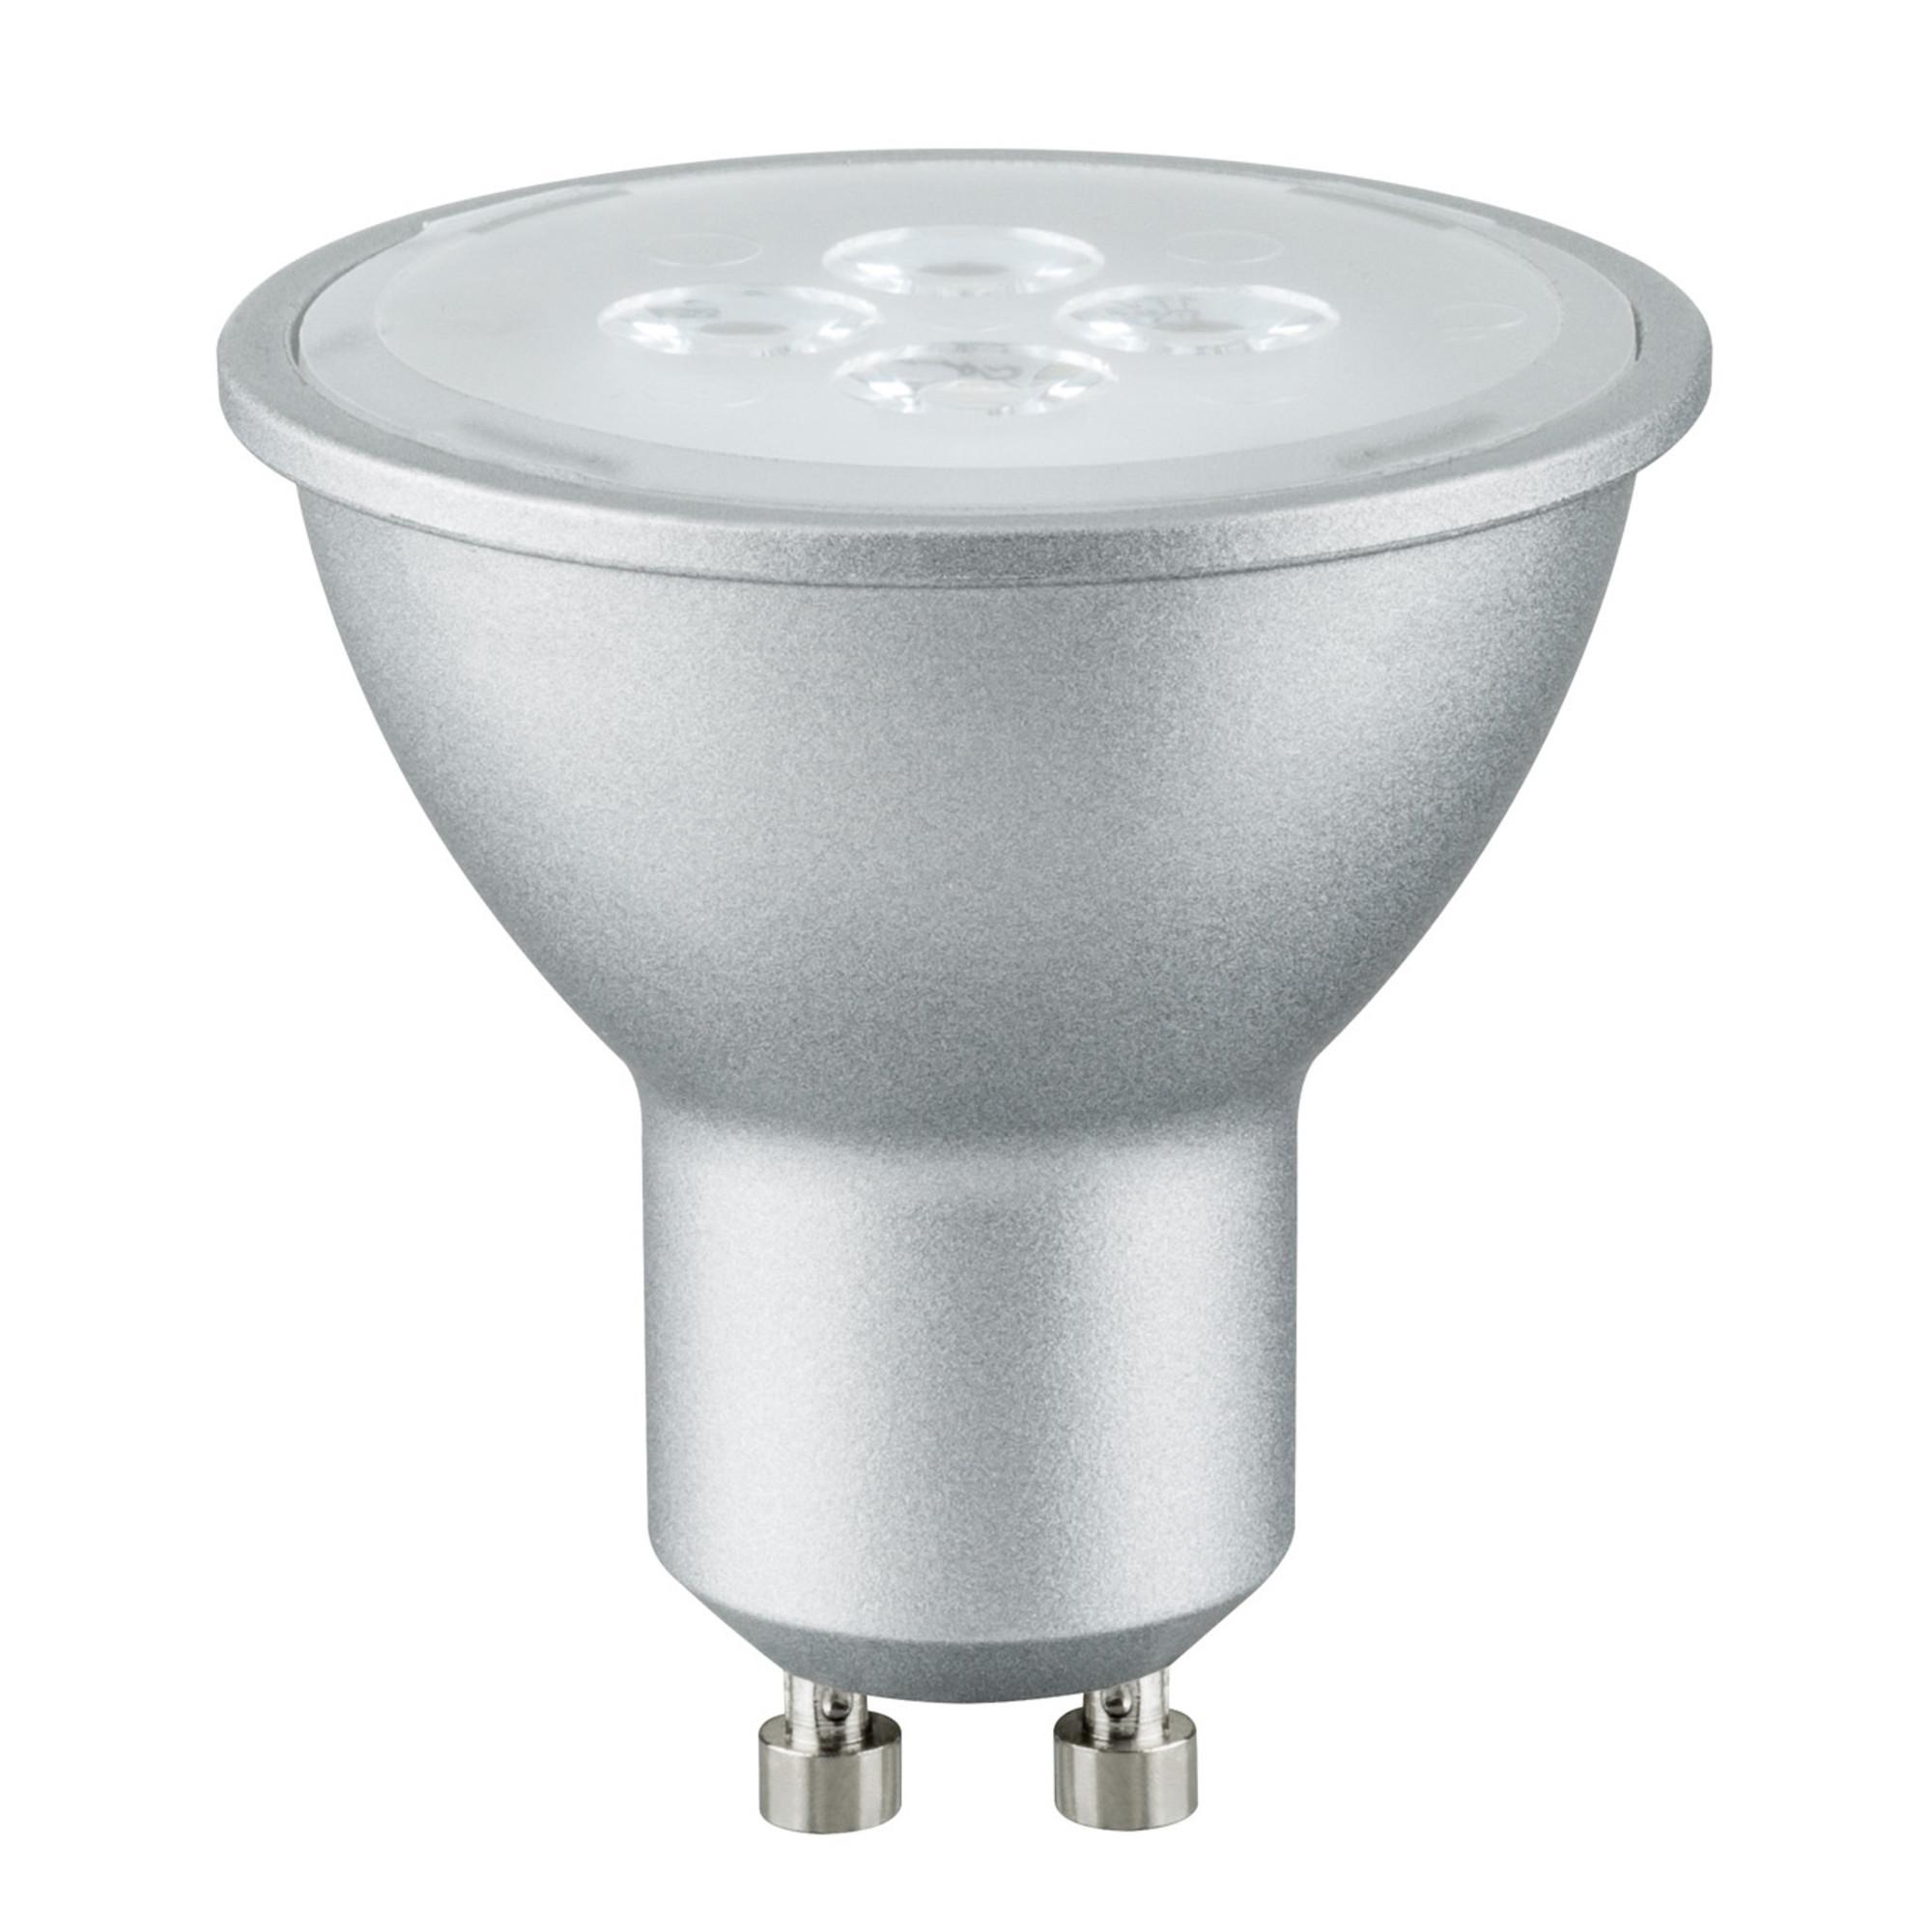 Лампа светодиодная Paulmann 28272 GU10 230 Лм теплый свет